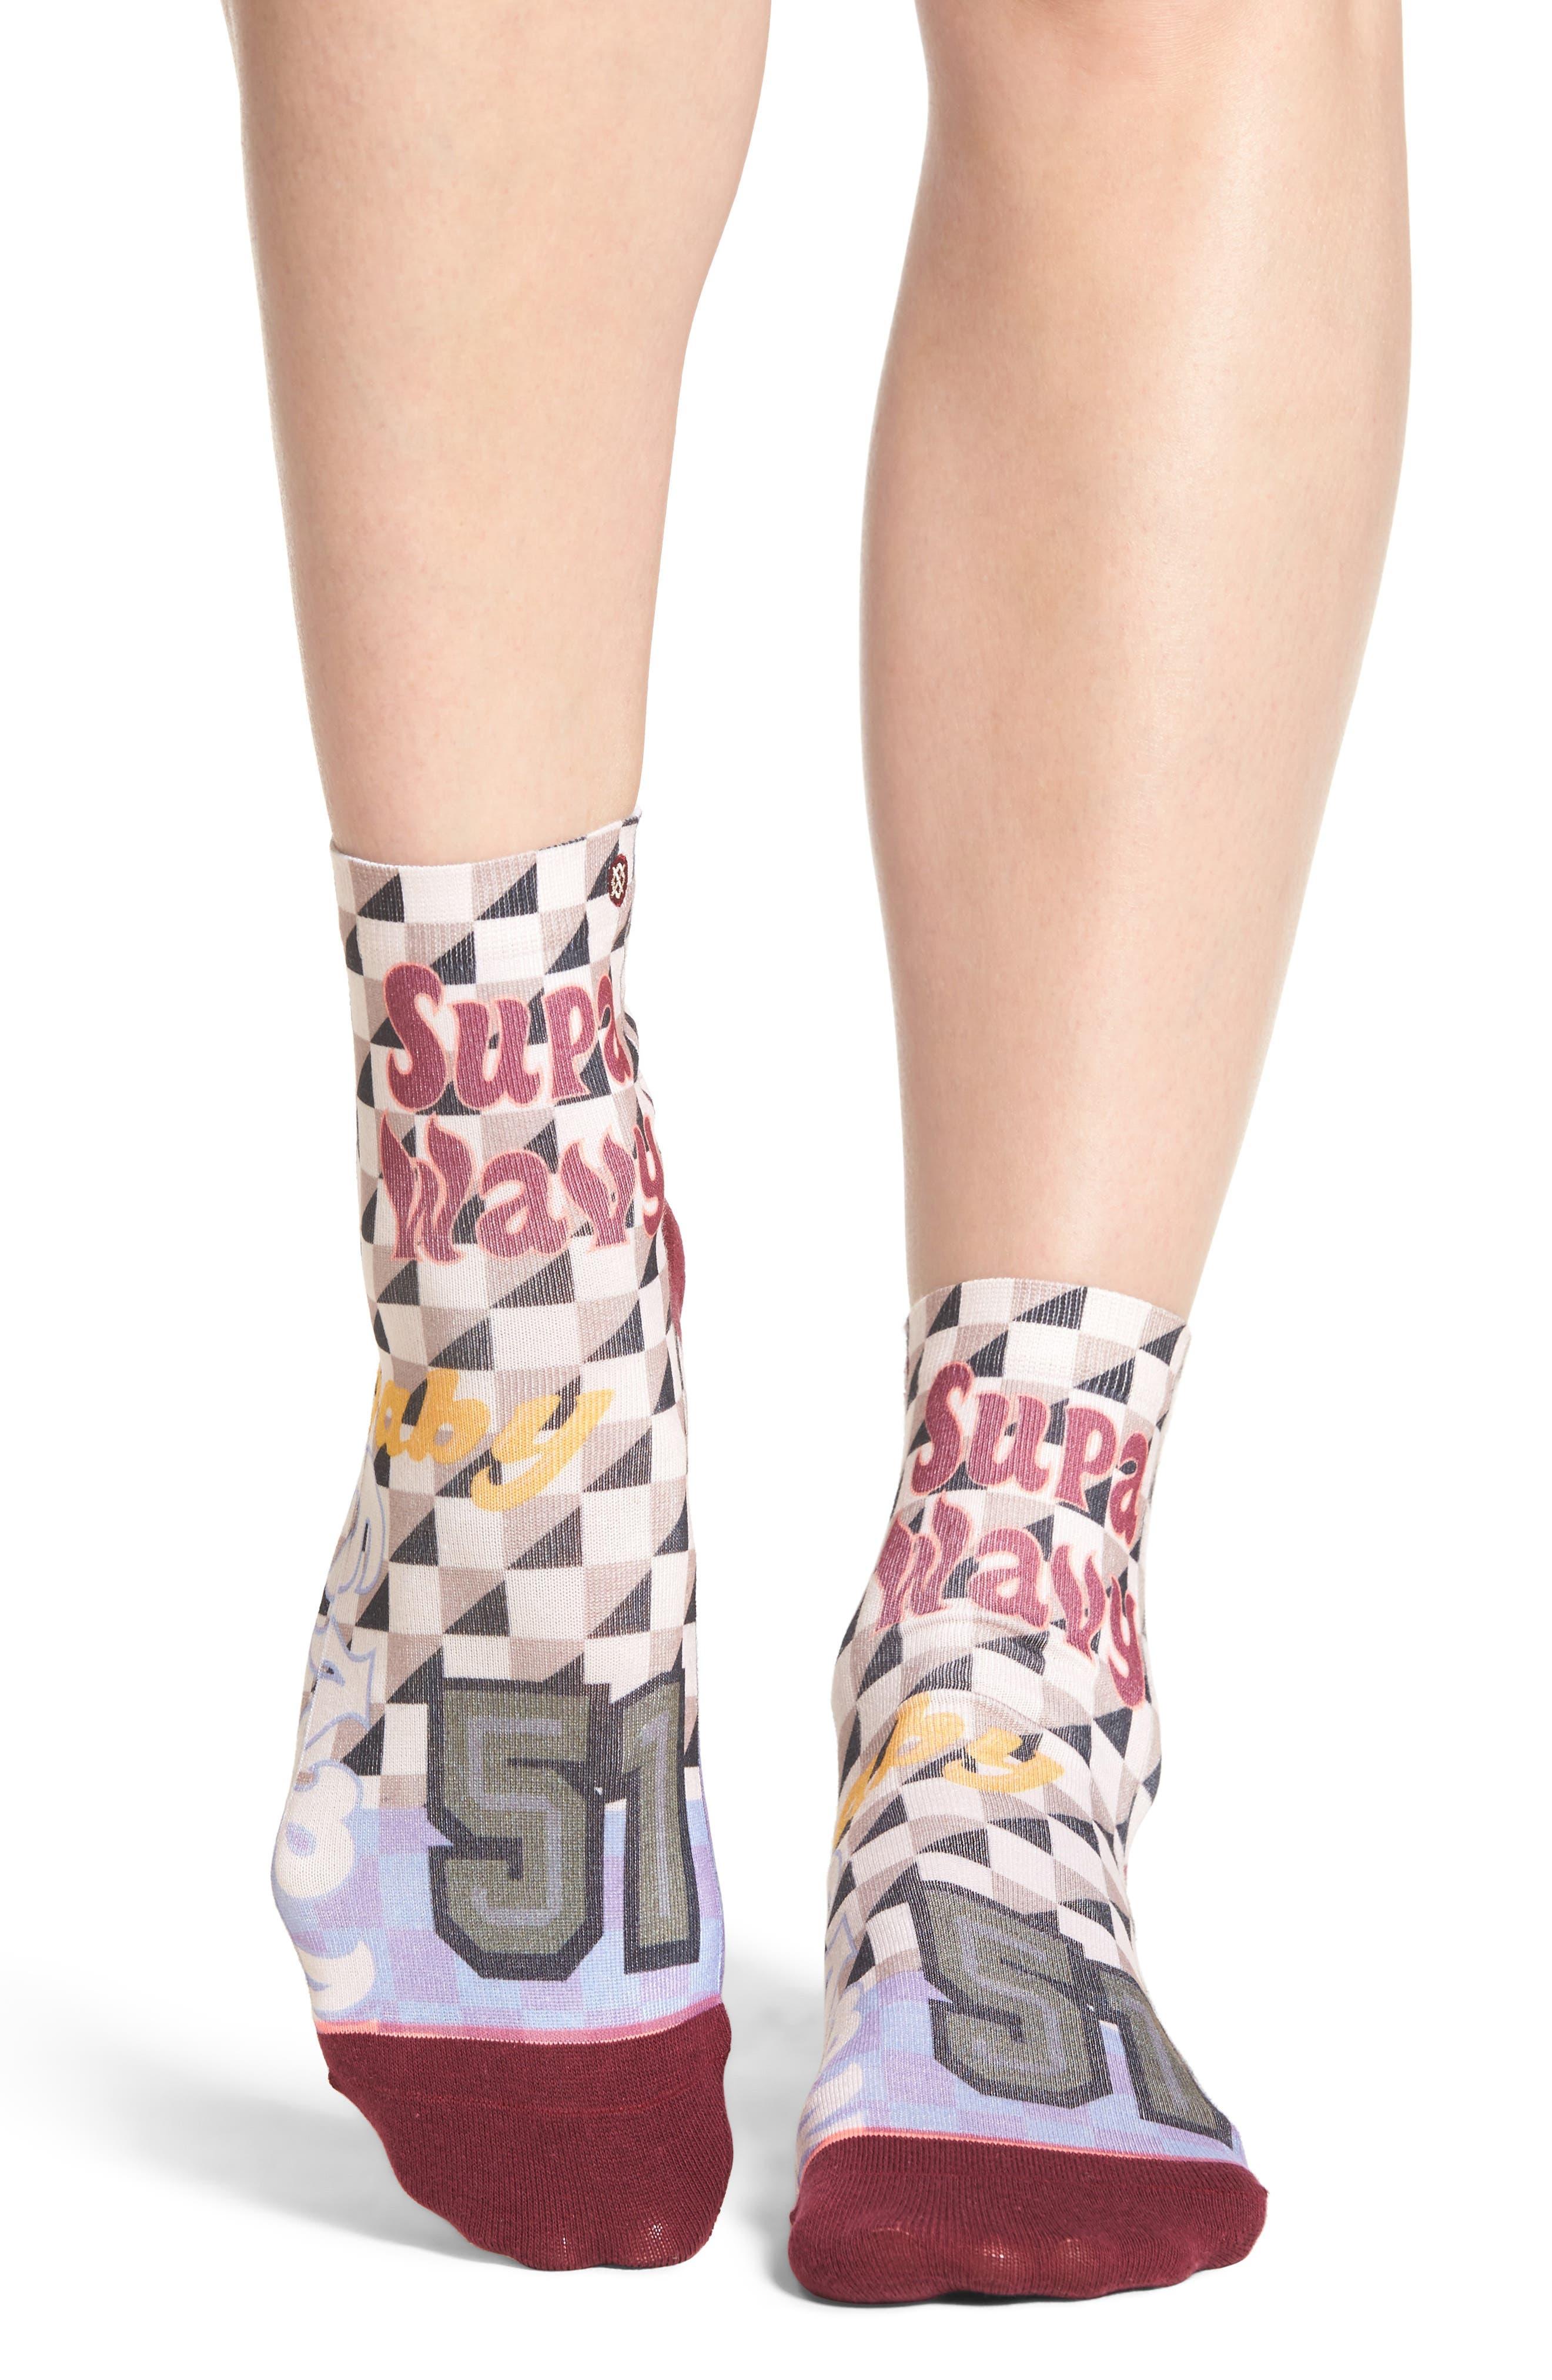 Lowrider Supa Wavy Socks,                             Main thumbnail 1, color,                             White Multi